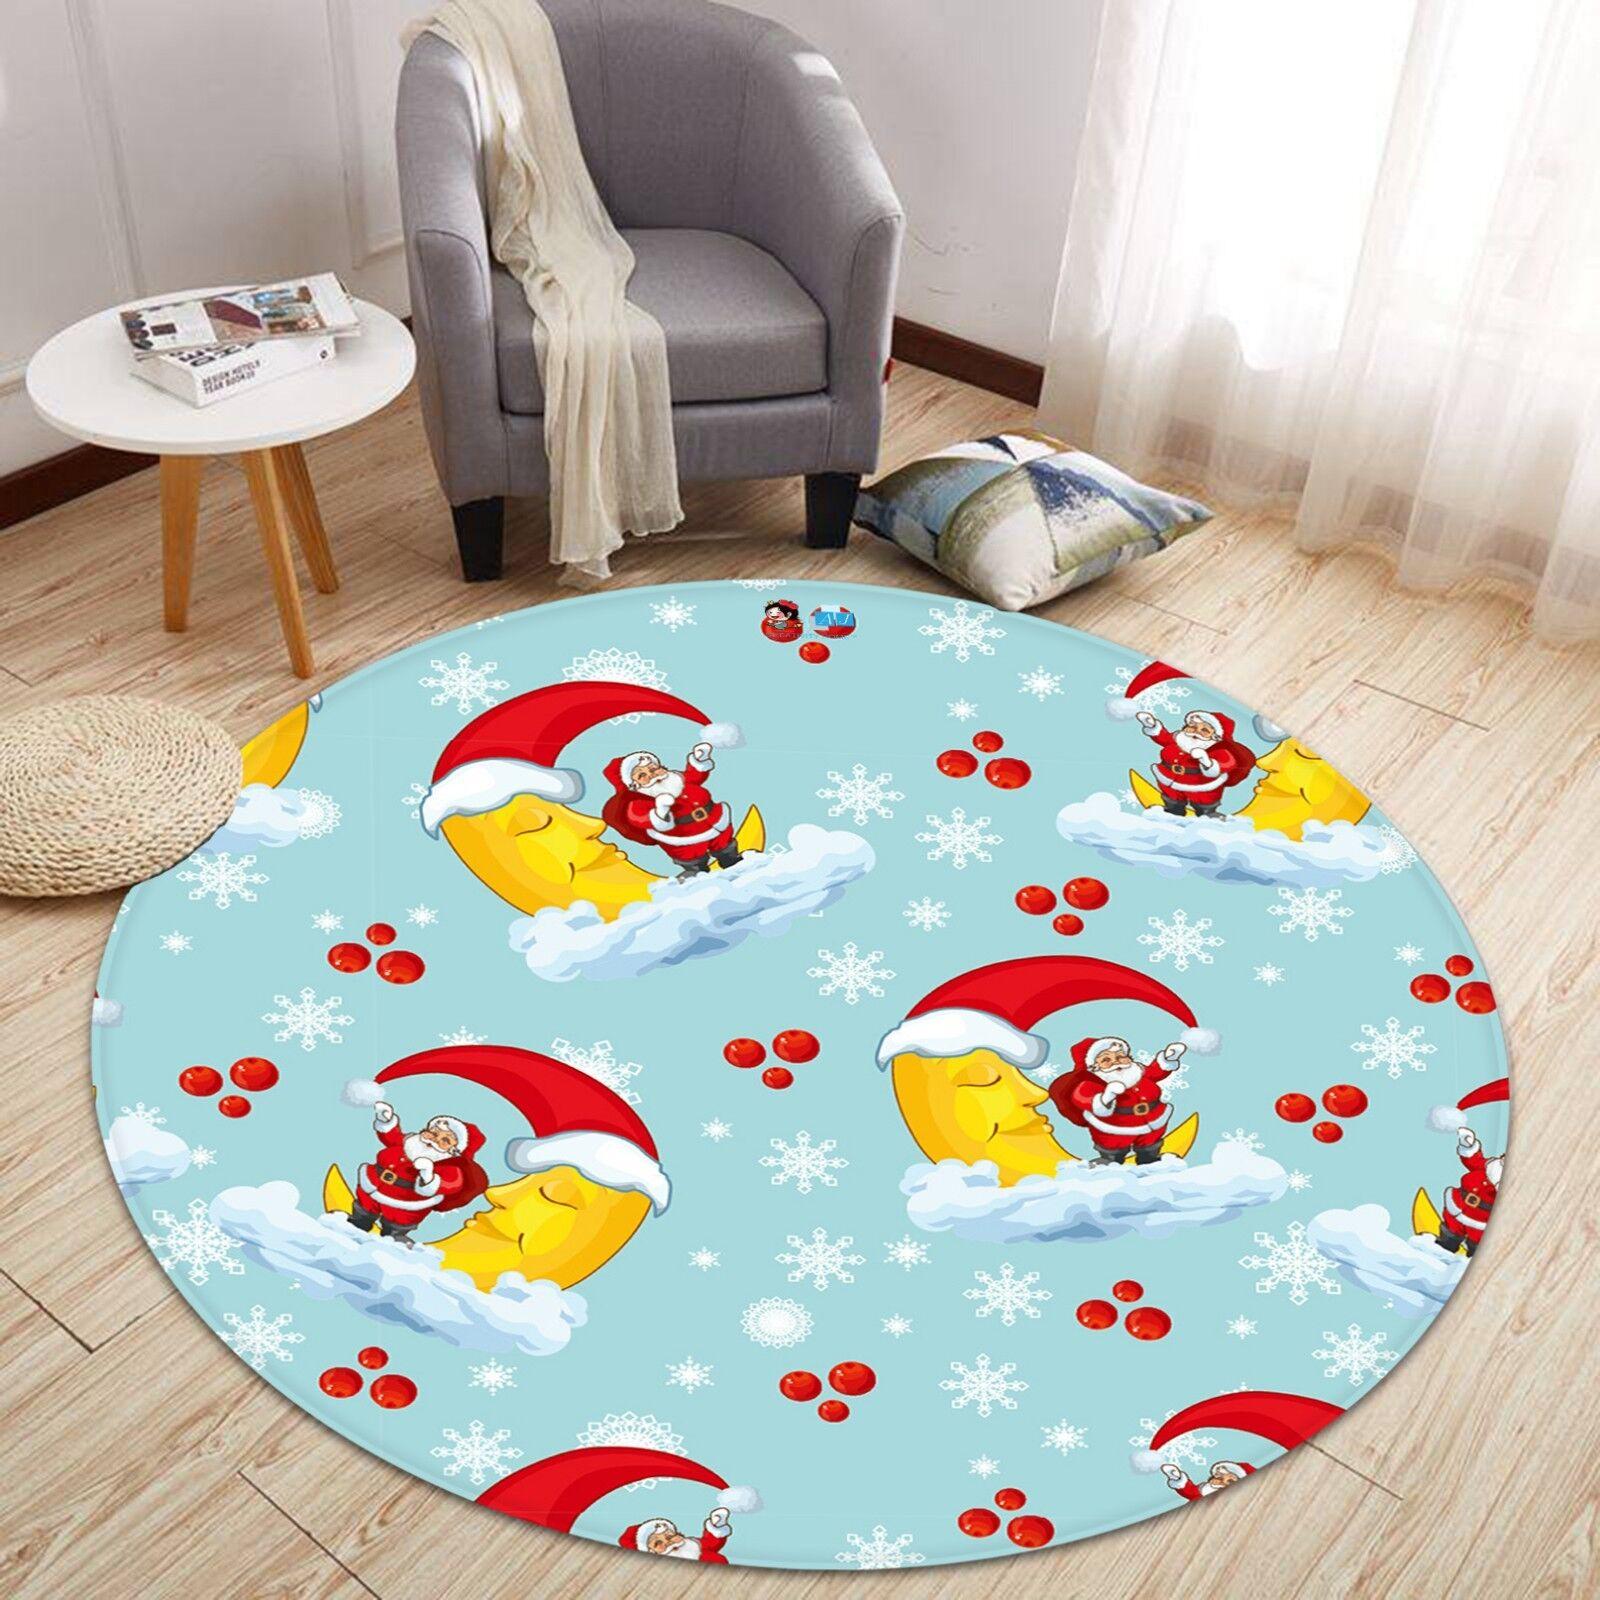 3d Natale Xmas 04 antiscivolo tappeto tappetino vano giri elegante TAPPETO de